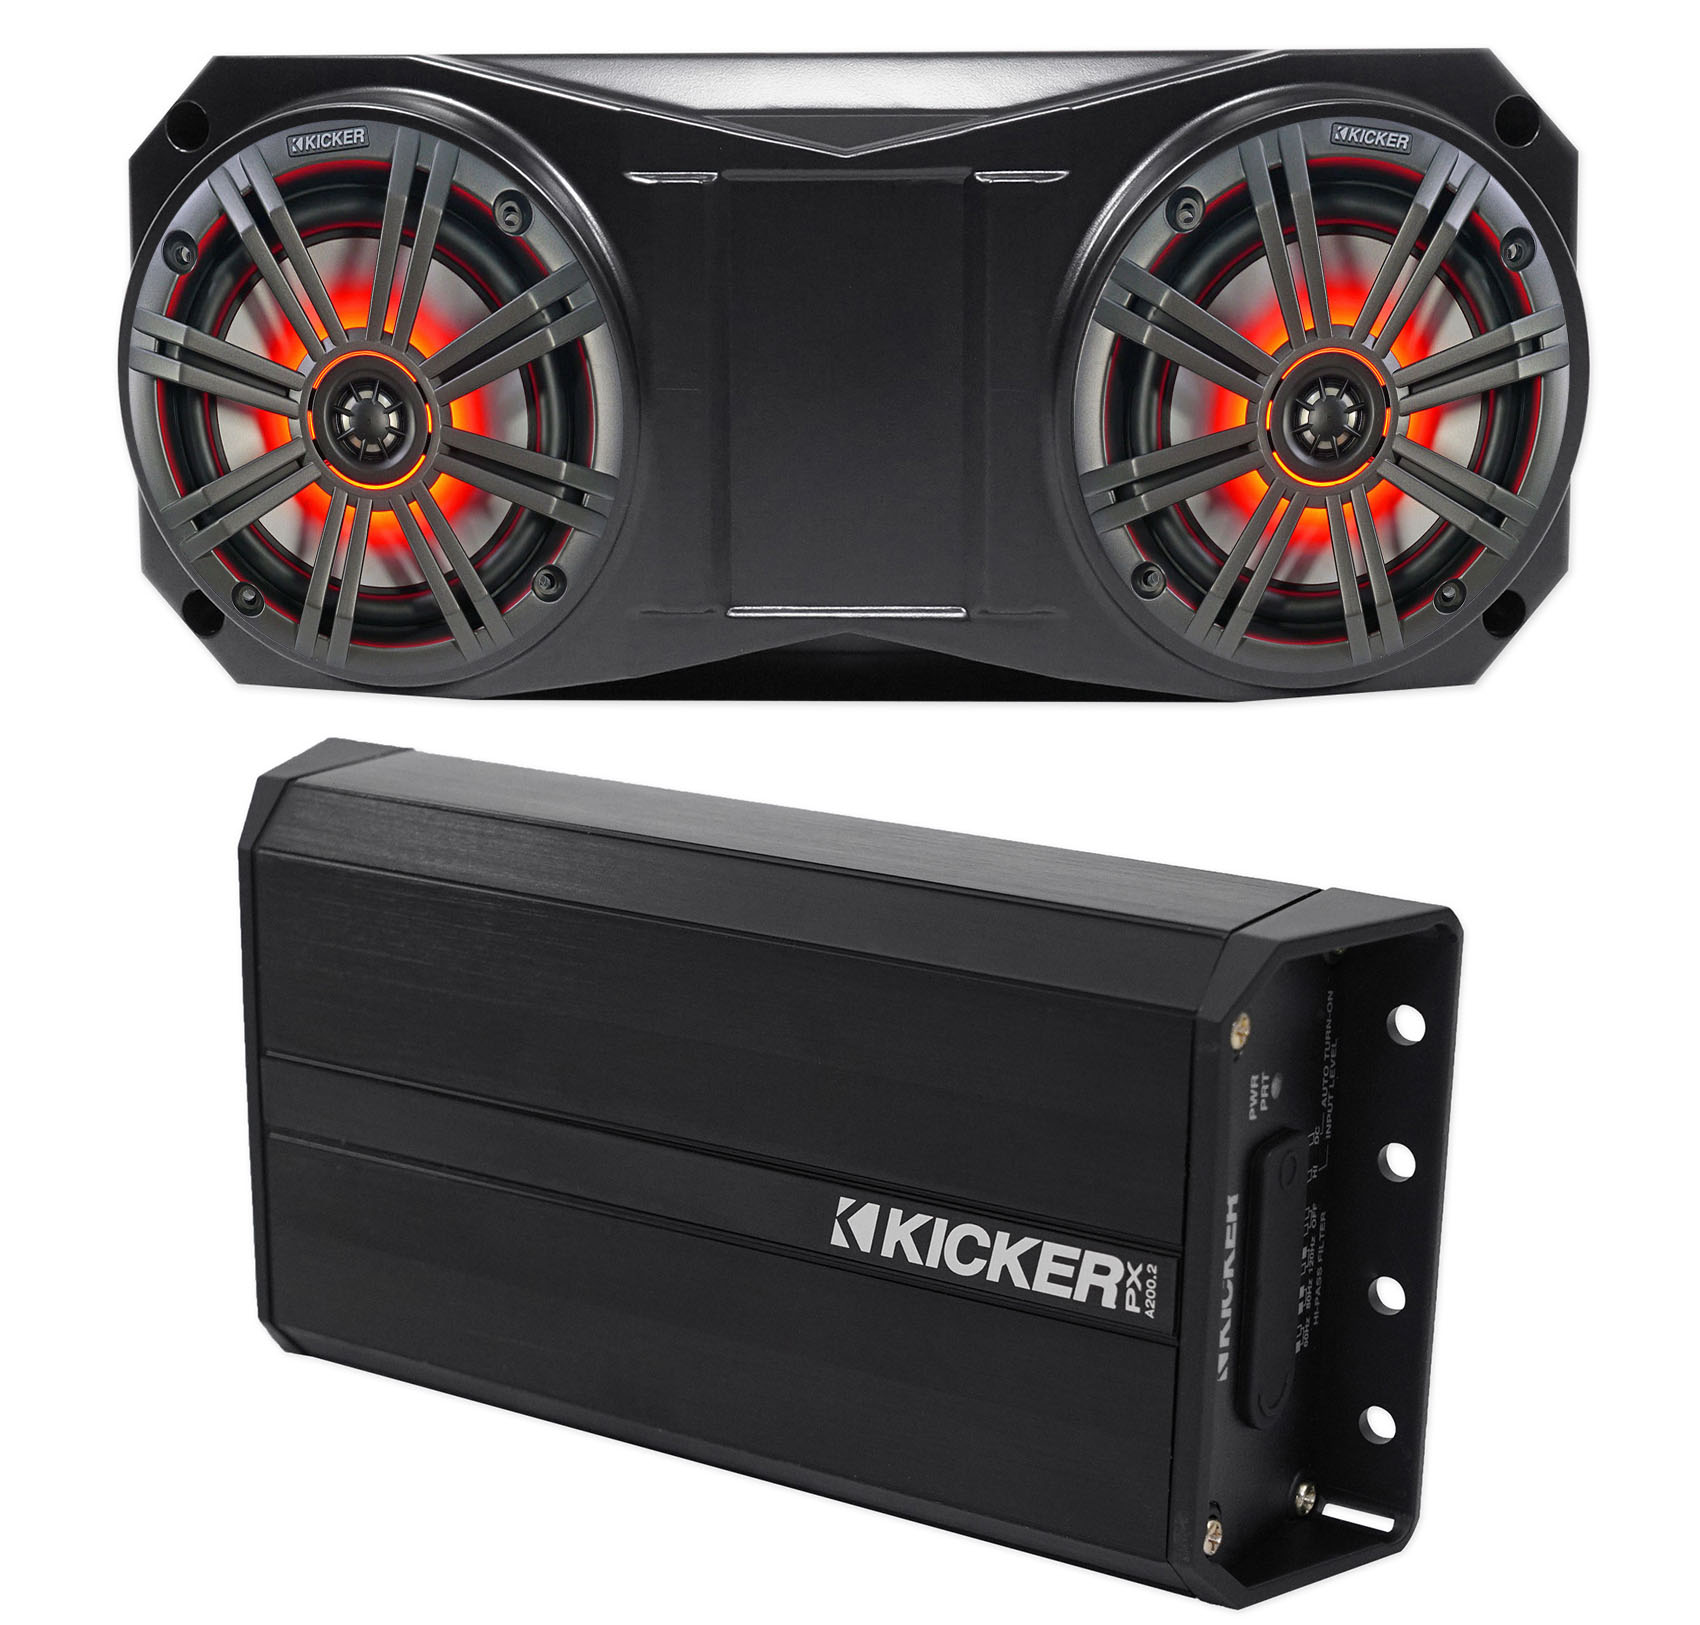 Kicker 42PXA200.2 200w 2-Ch Amplifier Polaris//Motorcycle//ATV//UTV//RZR//Cart+Wires